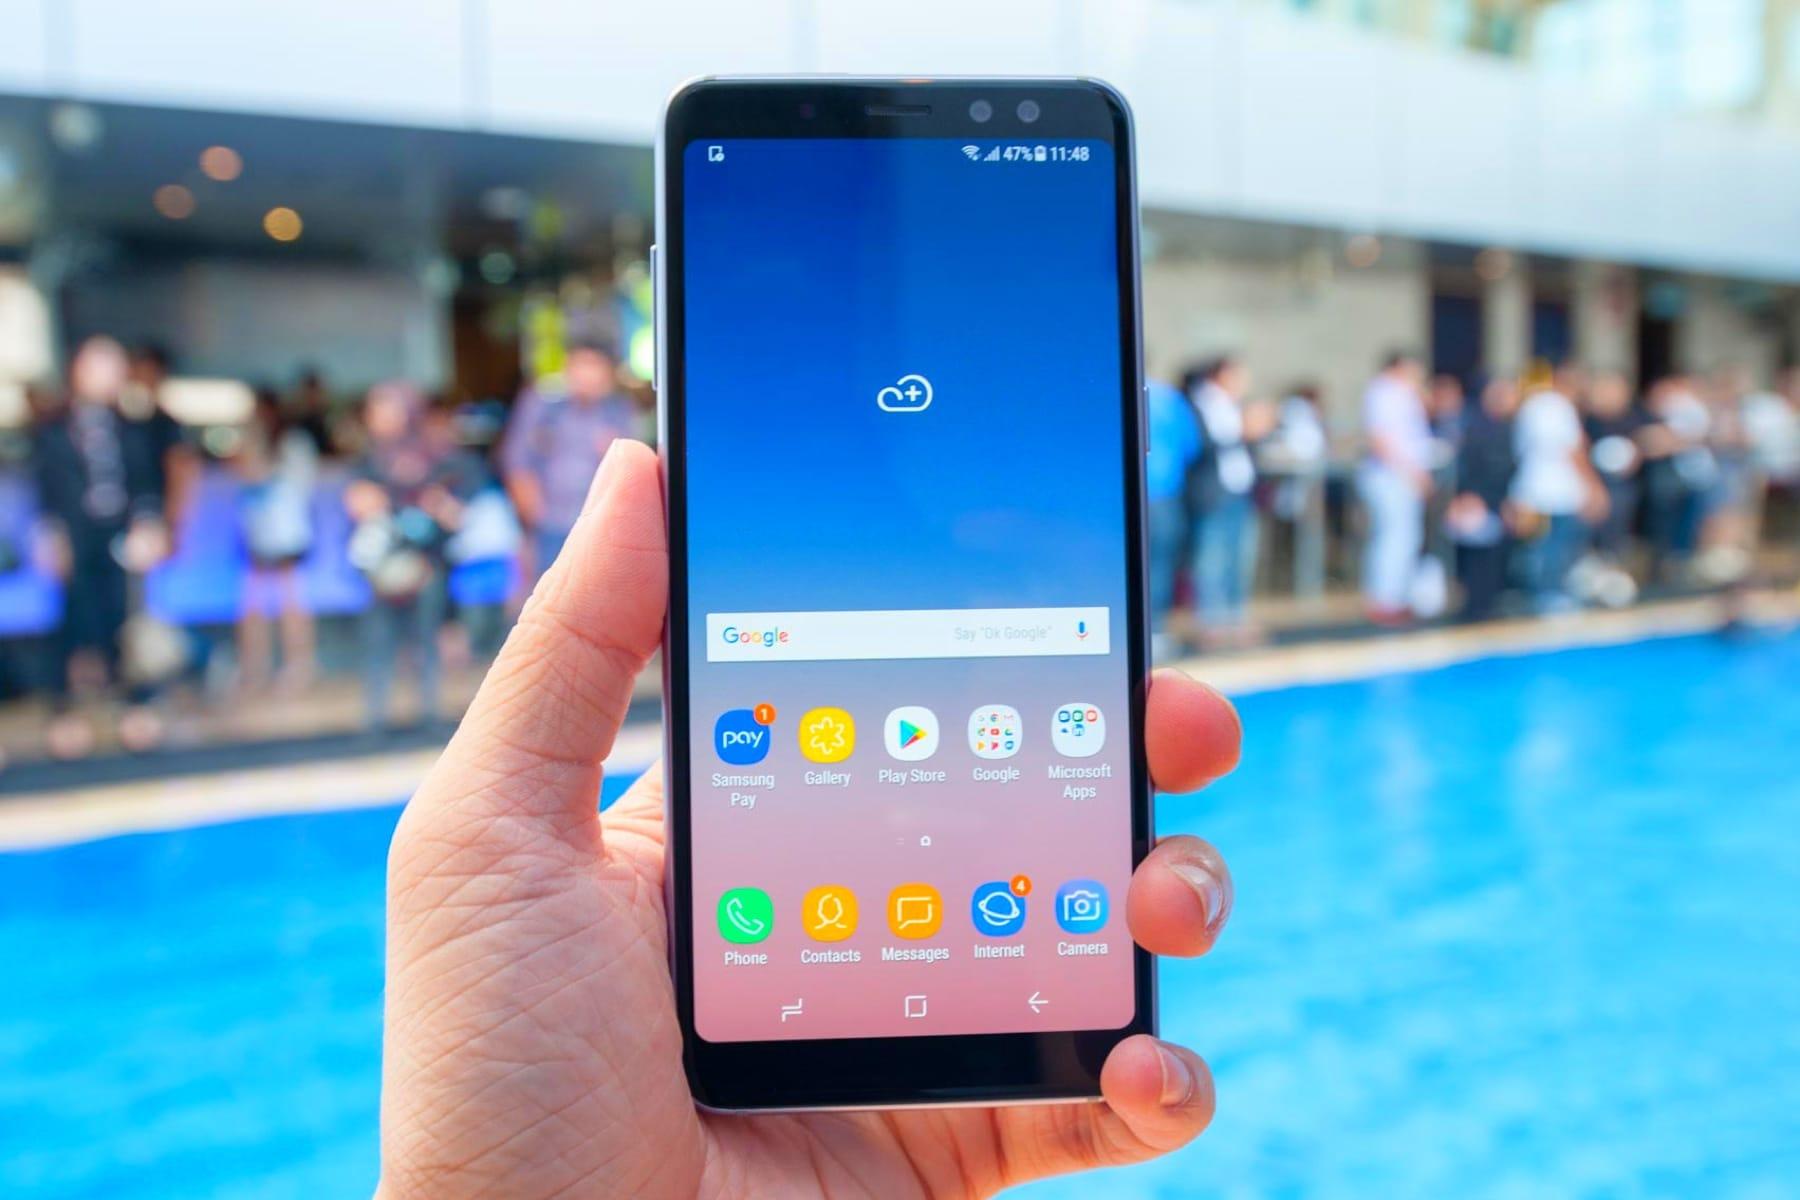 Googliercom Android Search Date 2018 10 01 Loop  Playstation Network Card 100000 Idr Digital Code Samsung Galaxy A8